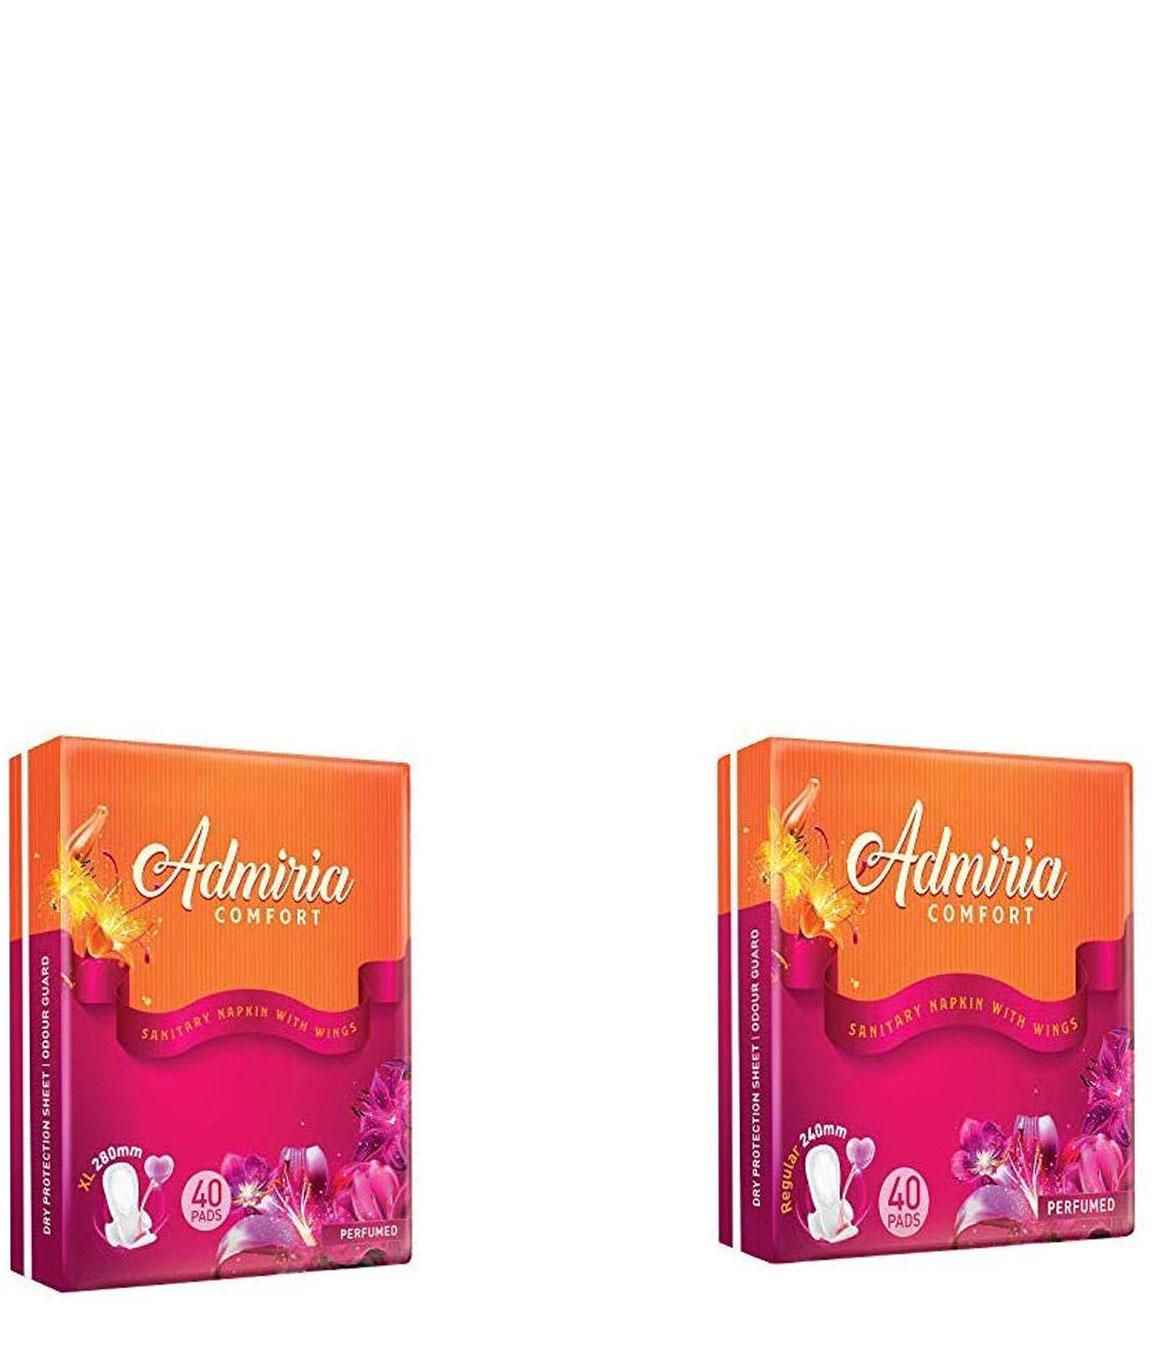 Admiria Comfort Sanitary Pad/Napkins - Extra Large (XL) (Pack of 40) & Admiria Comfort Sanitary Pad/Napkins - Regular (Pack of 40)